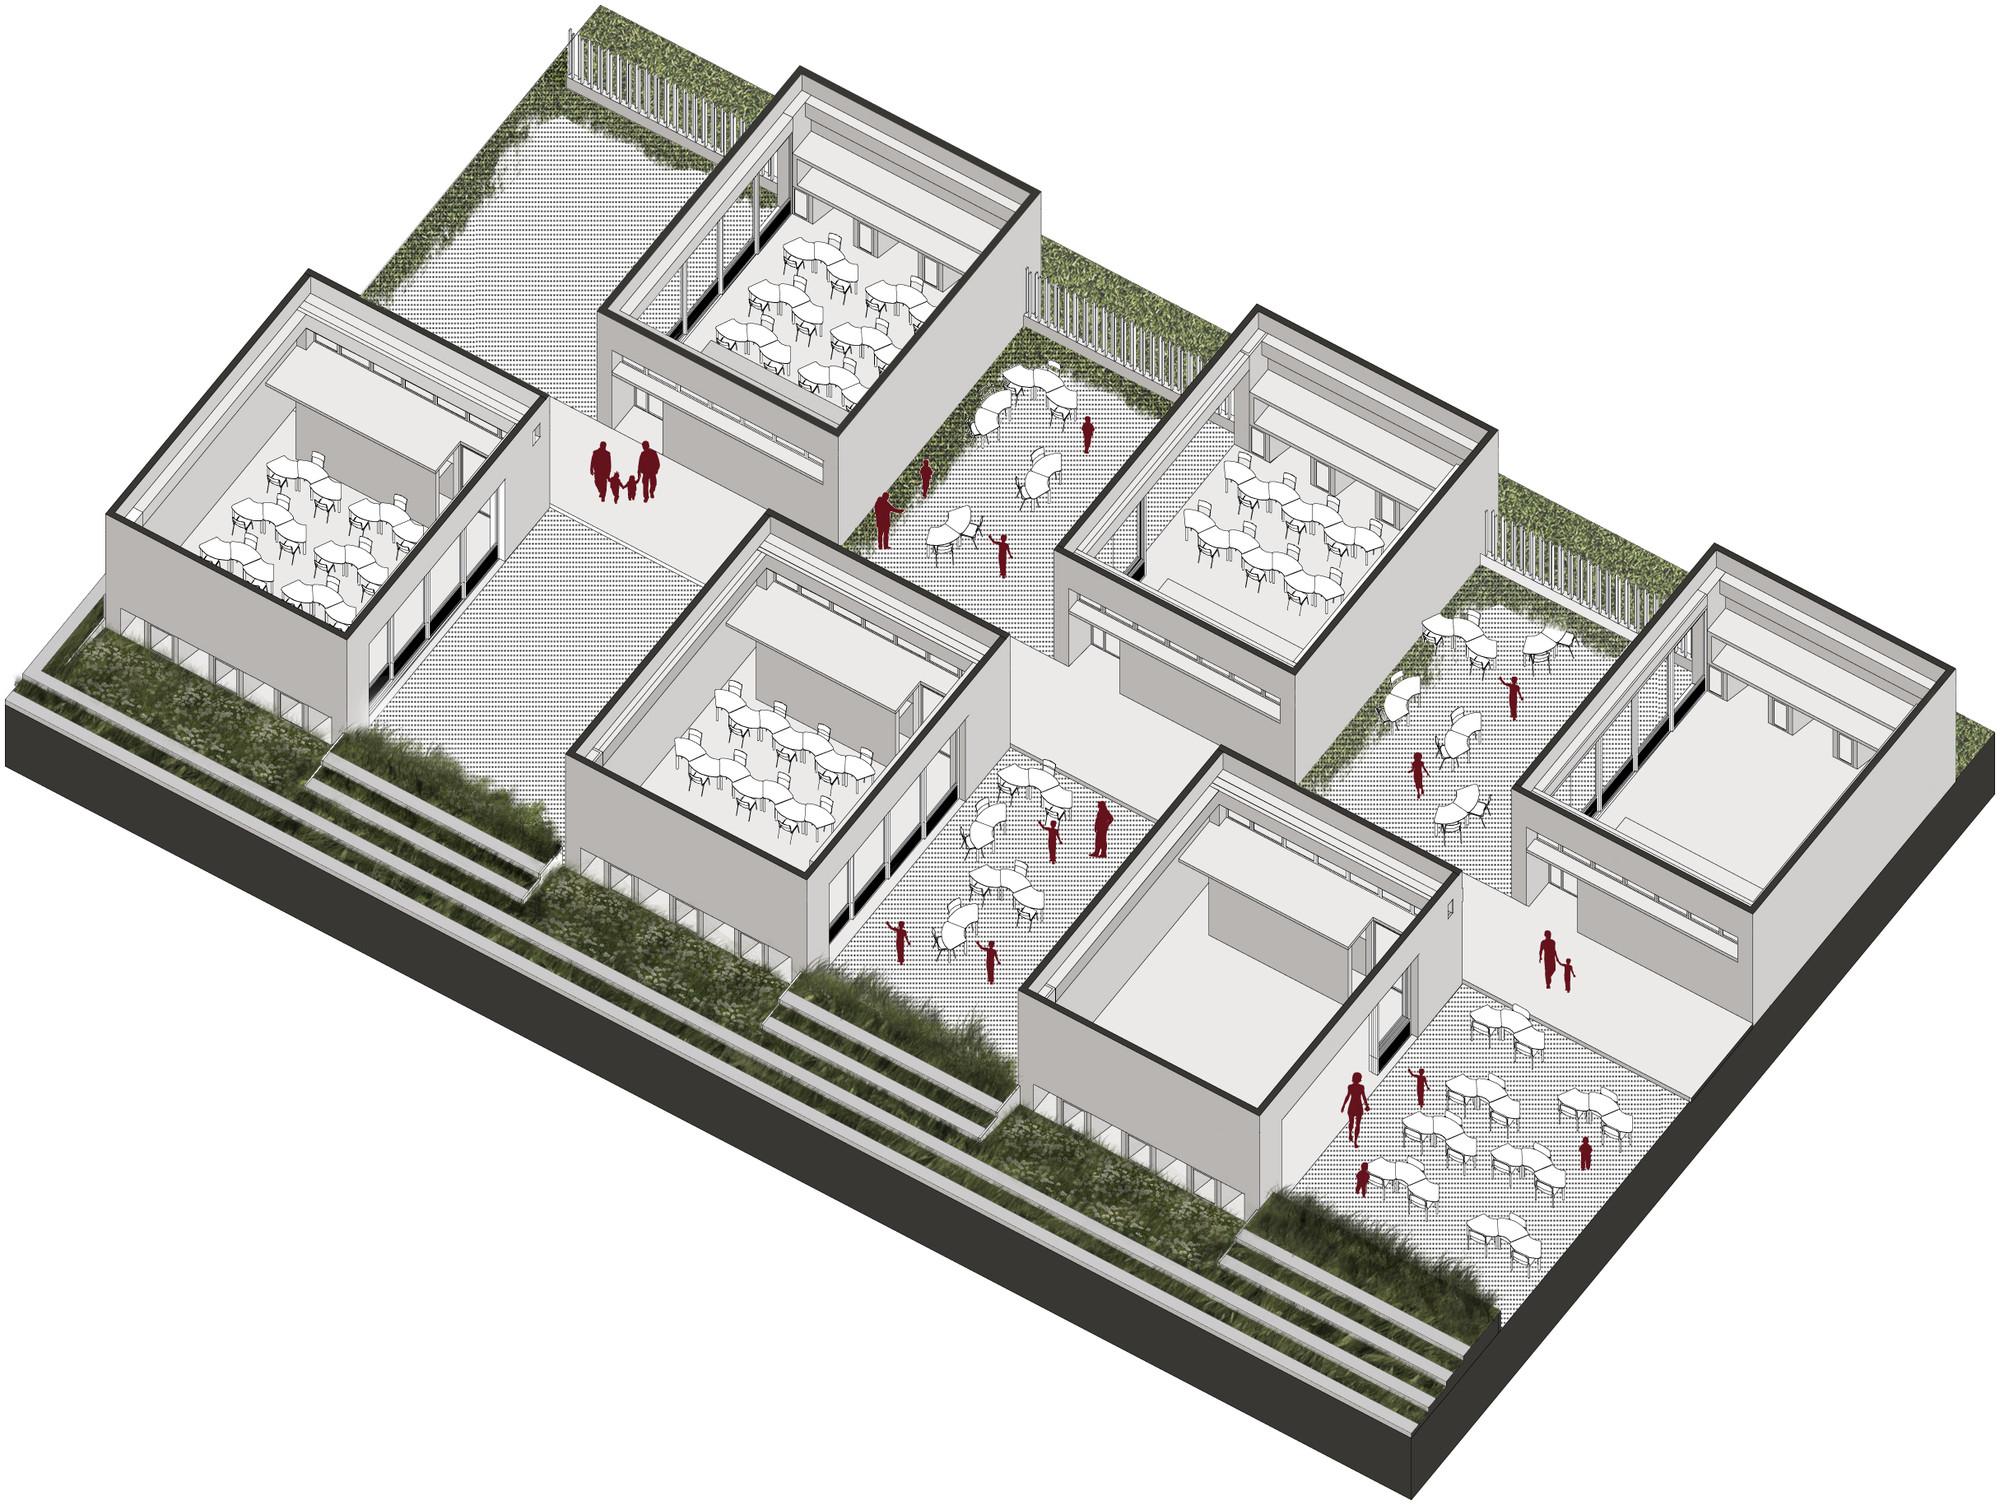 Sistema de patios - pre escolar. Image Courtesy of FP – oficina de arquitectura + Arq. Camilo Foronda